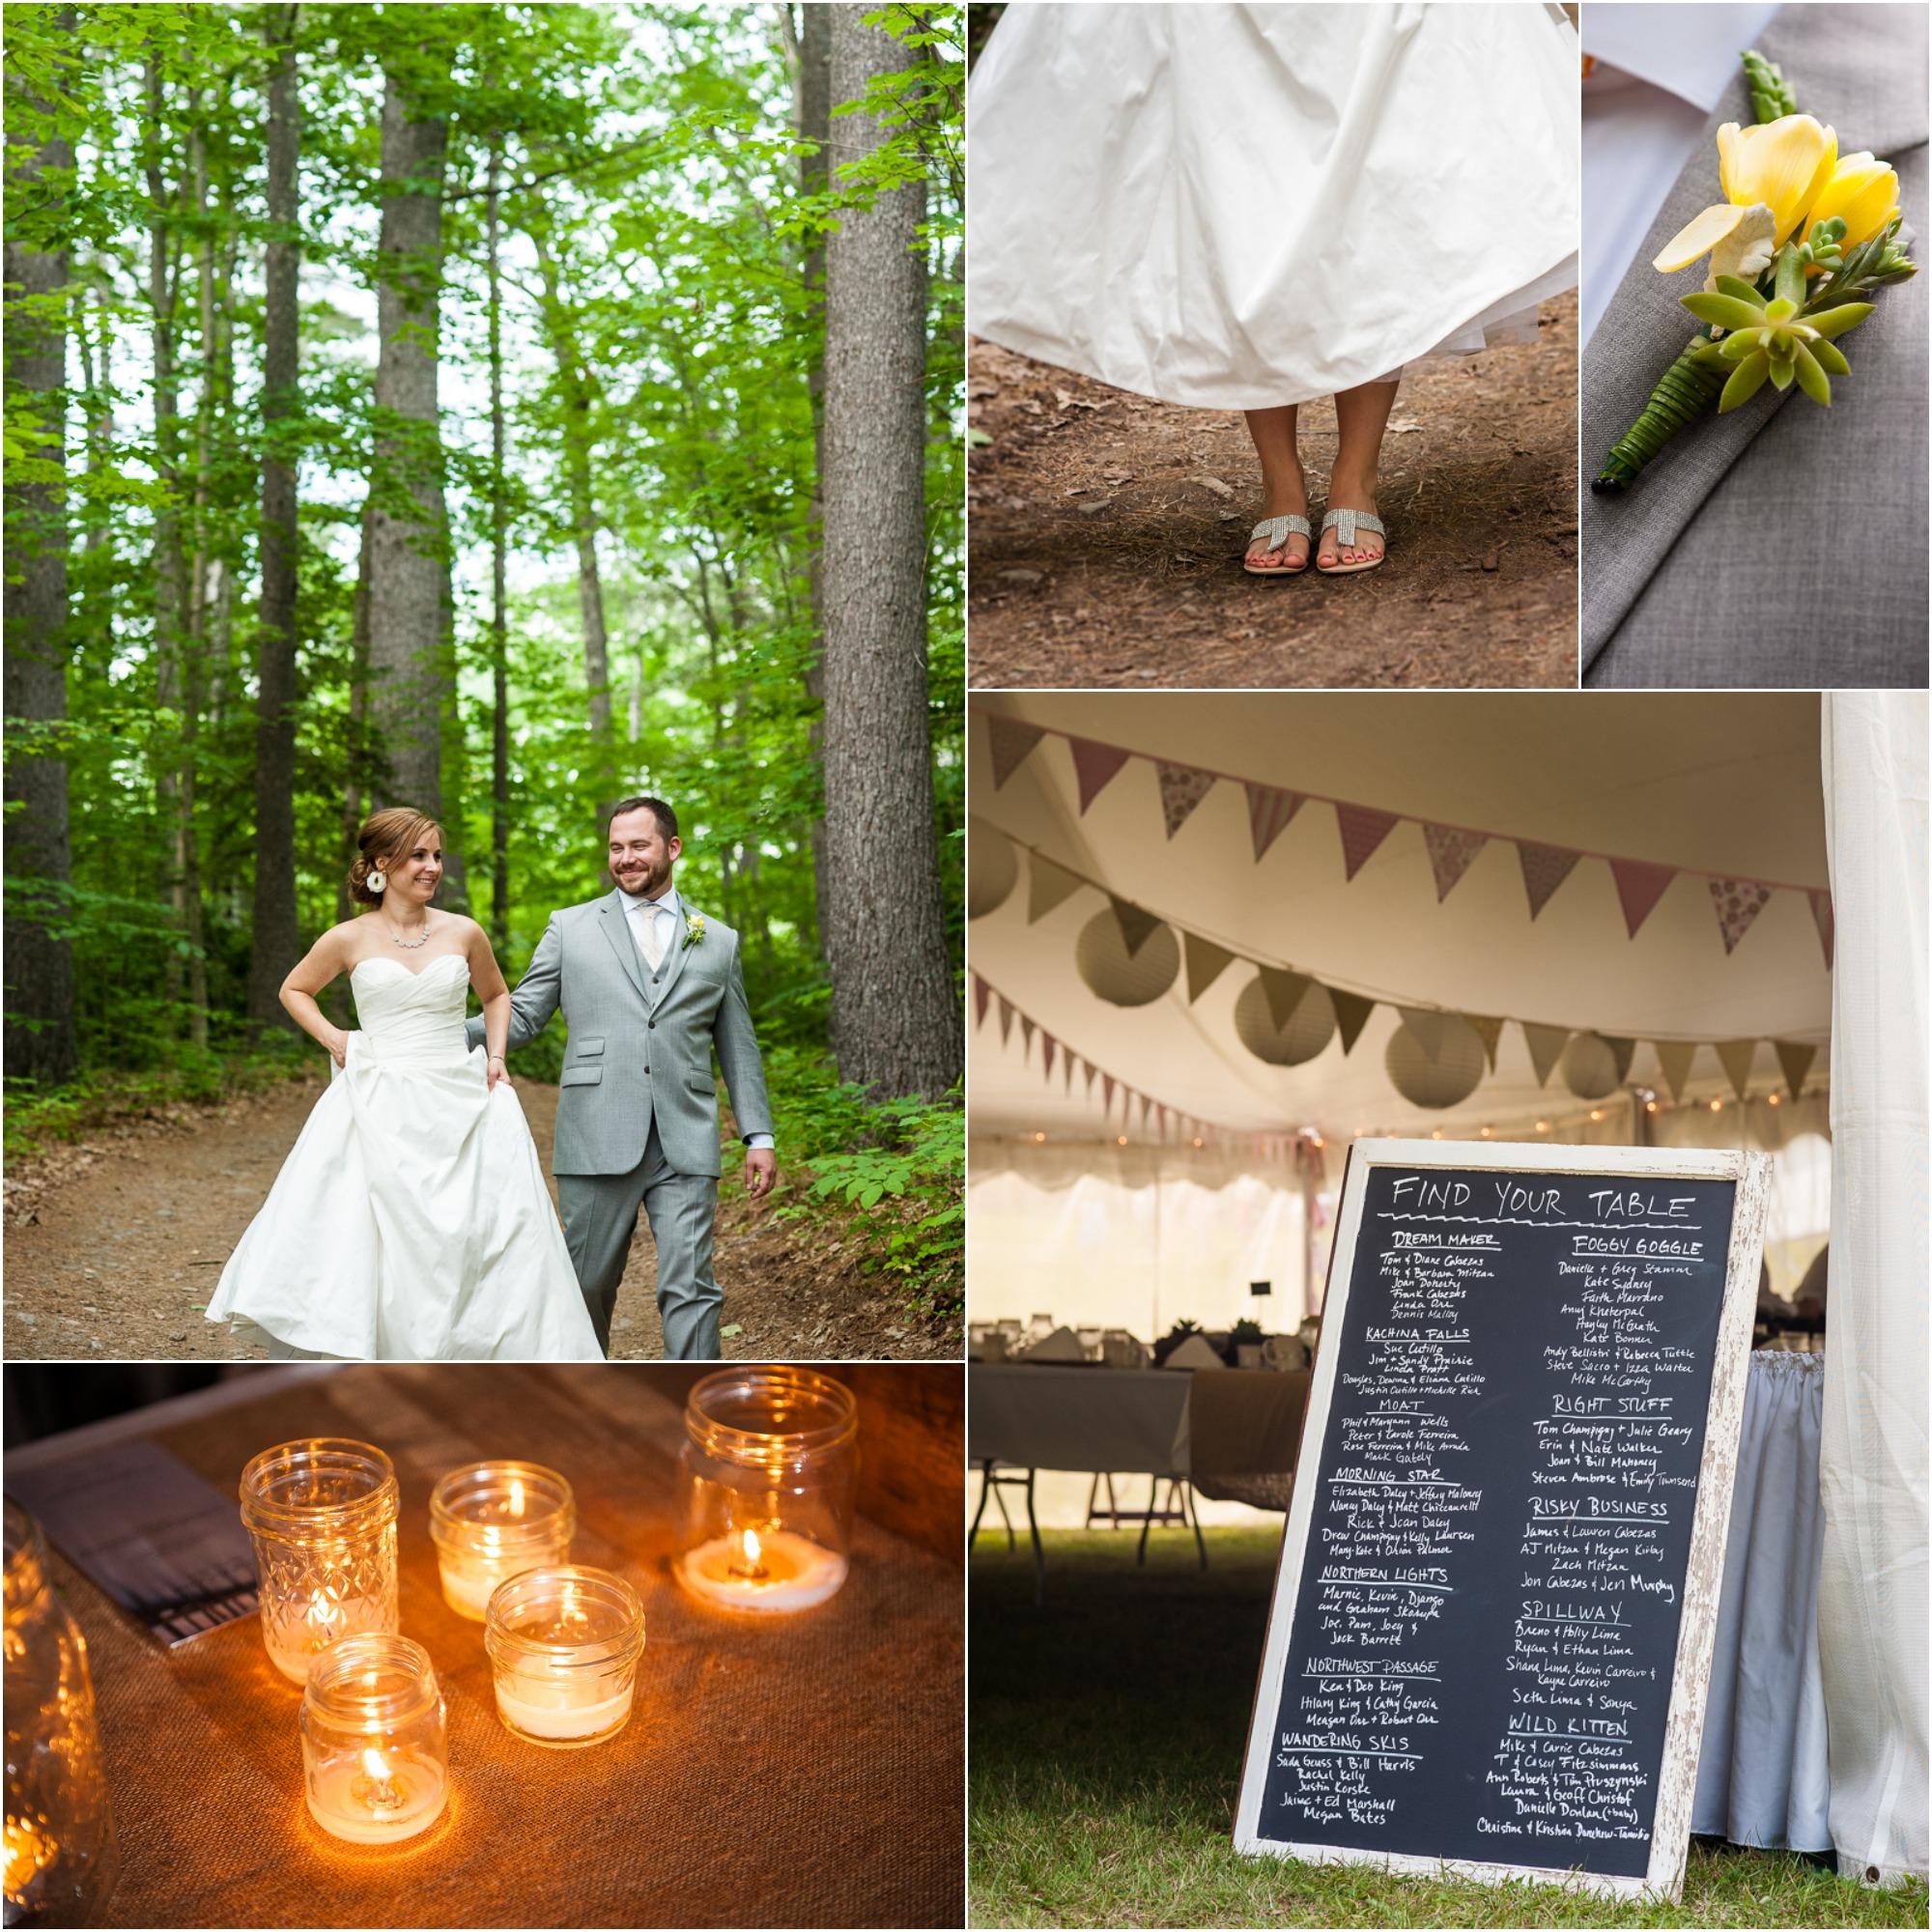 New Hampshire Lake Wedding Rustic Wedding Chic